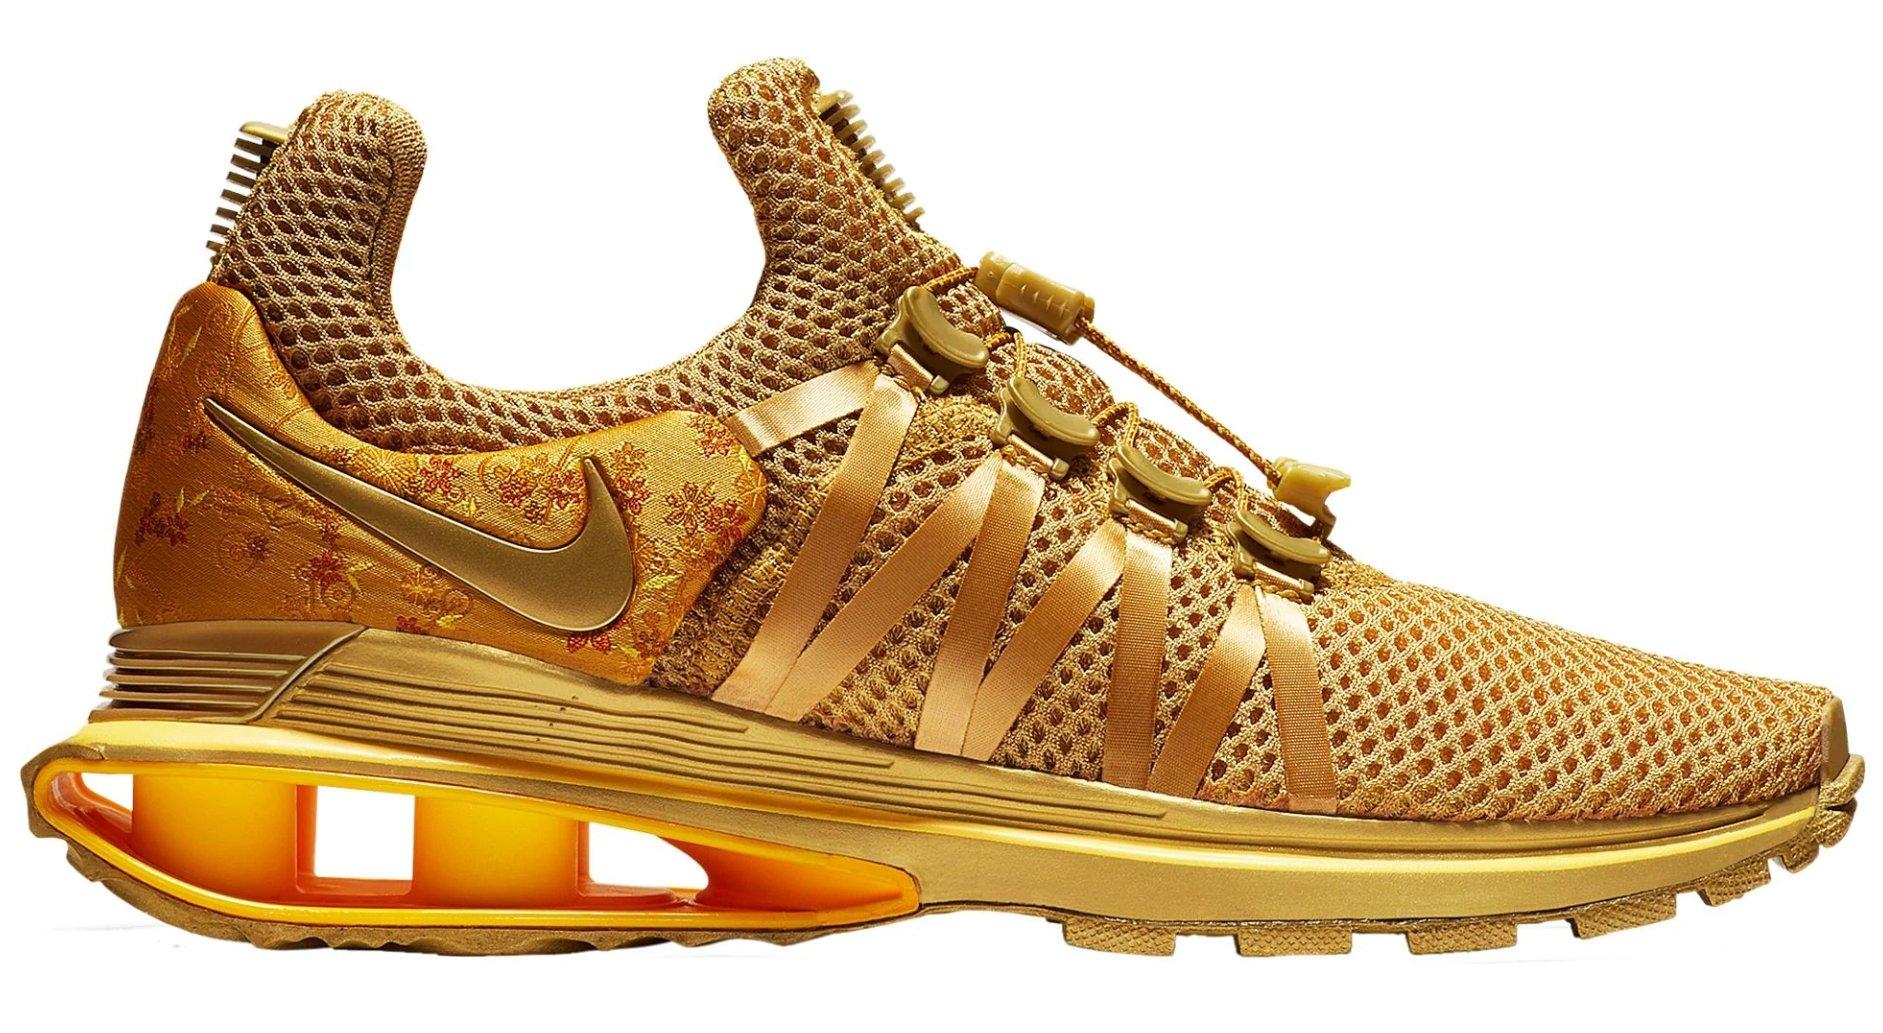 NIKE Womens Shox Gravity Metallic Gold Running Shoe AQ8854-700 (6 B(M) US)